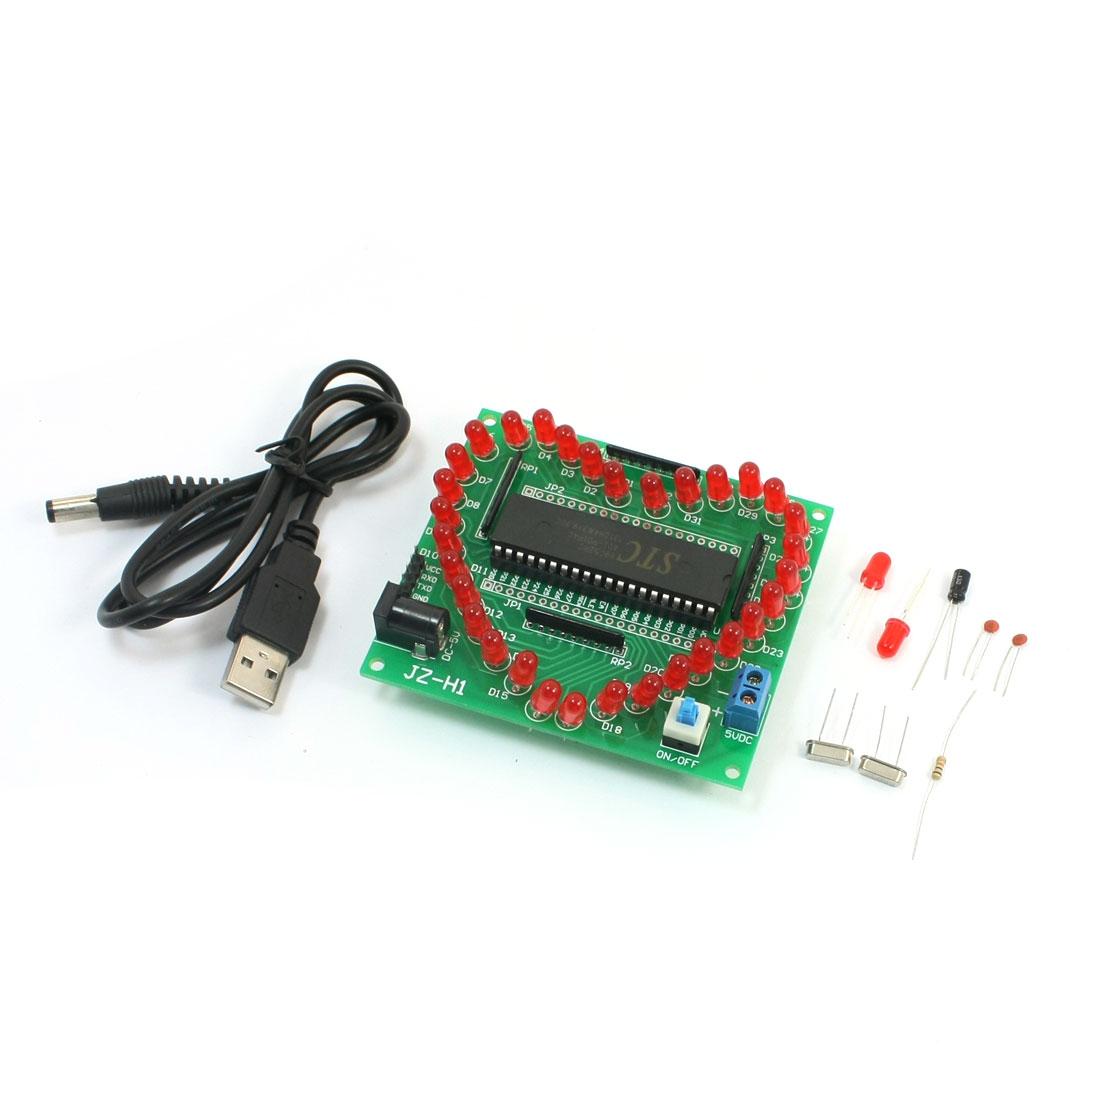 51 Microcontroller Heart Shaped LED Module Blank Board Parts